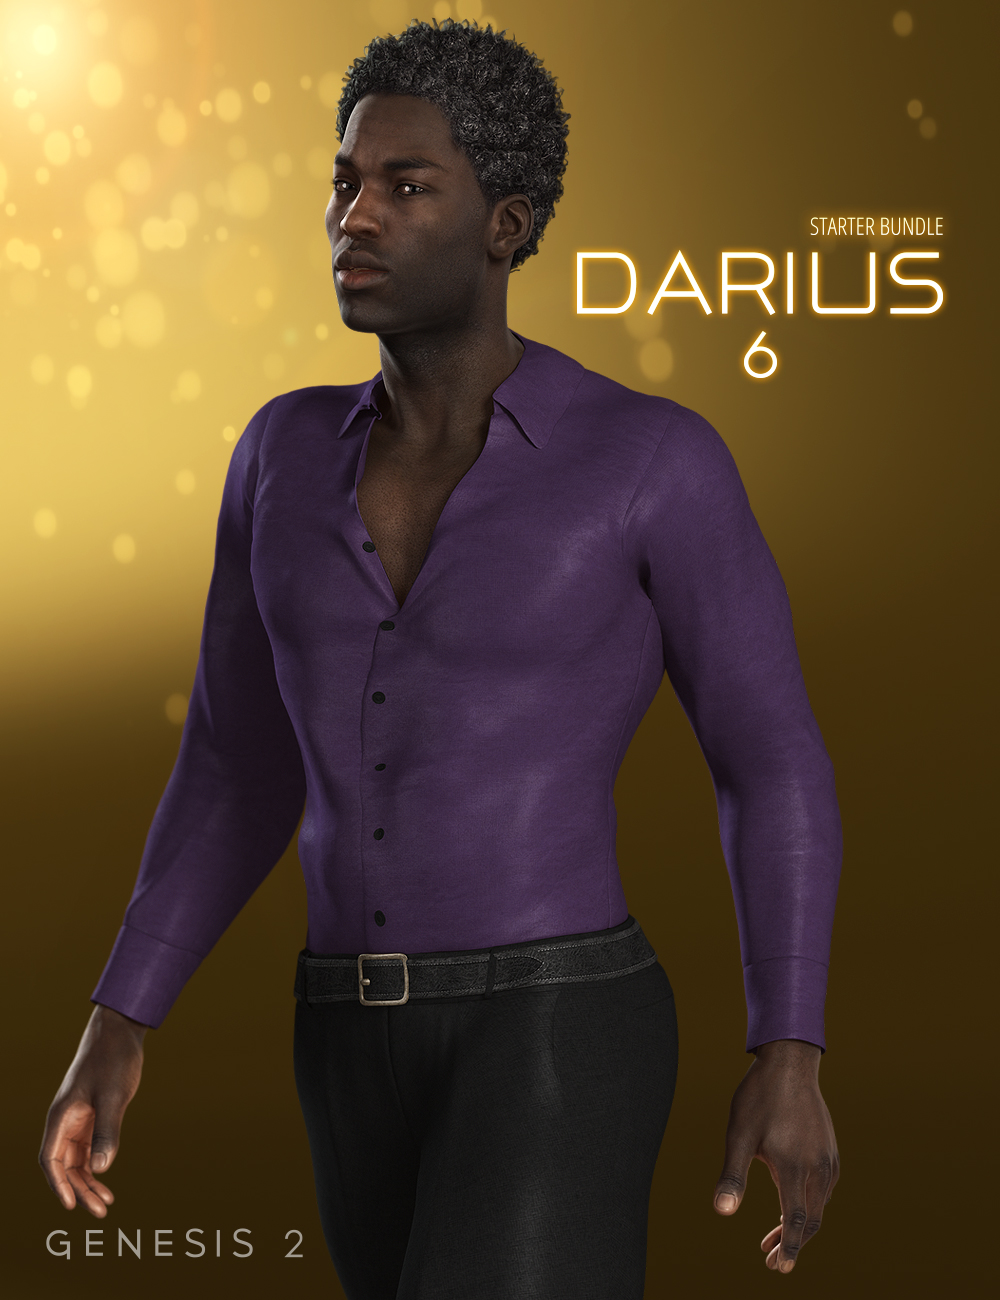 Darius 6 Starter Bundle by: , 3D Models by Daz 3D